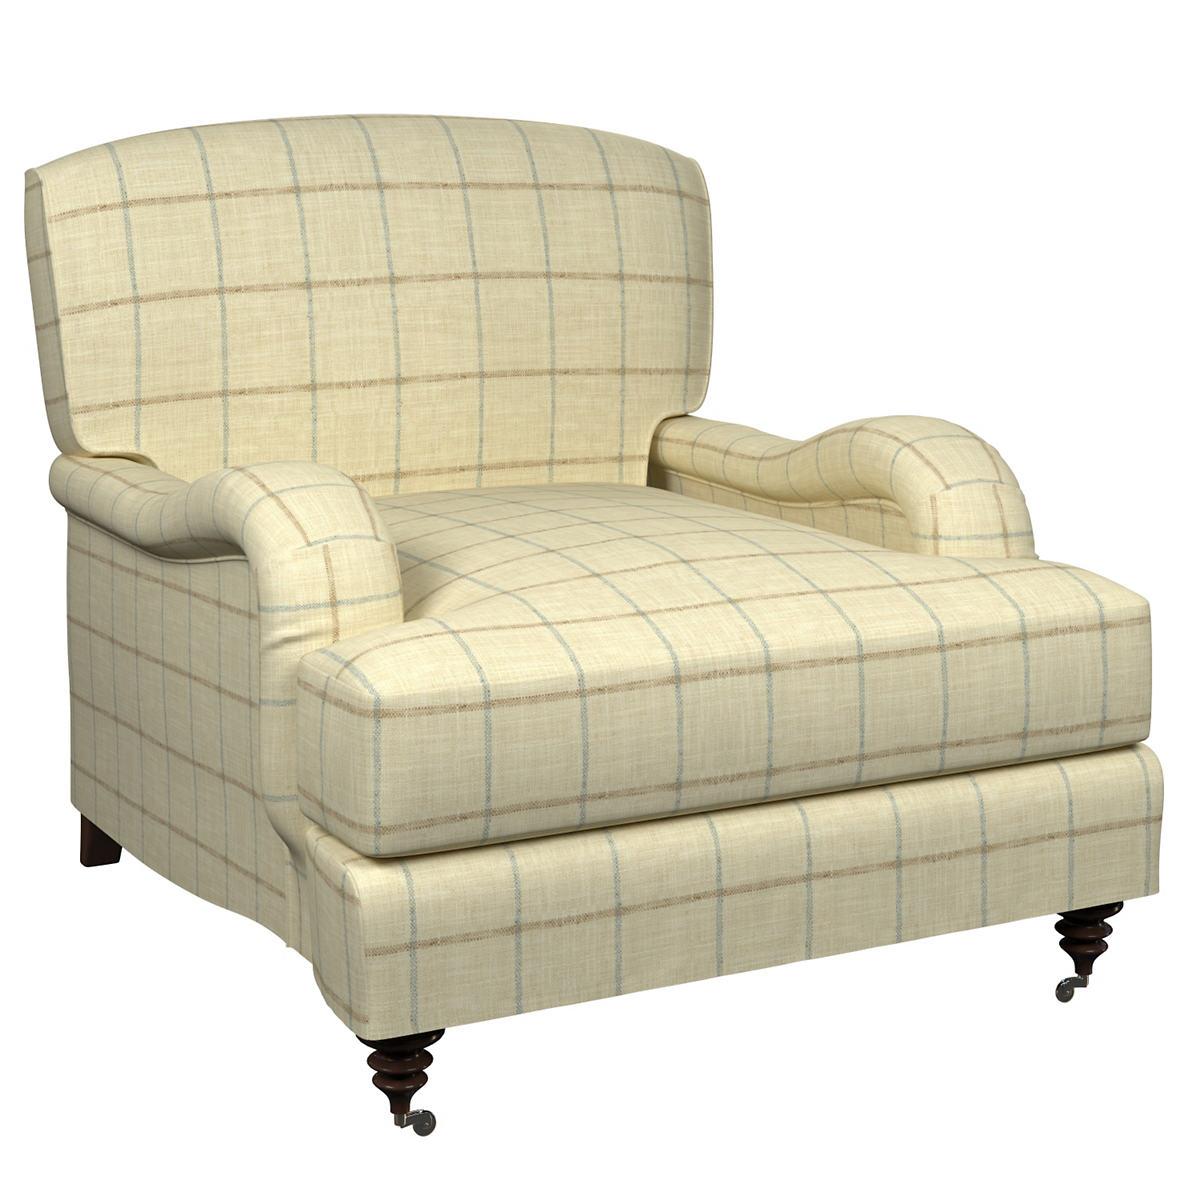 Chatham Tattersall Light Blue/Natural Litchfield Chair